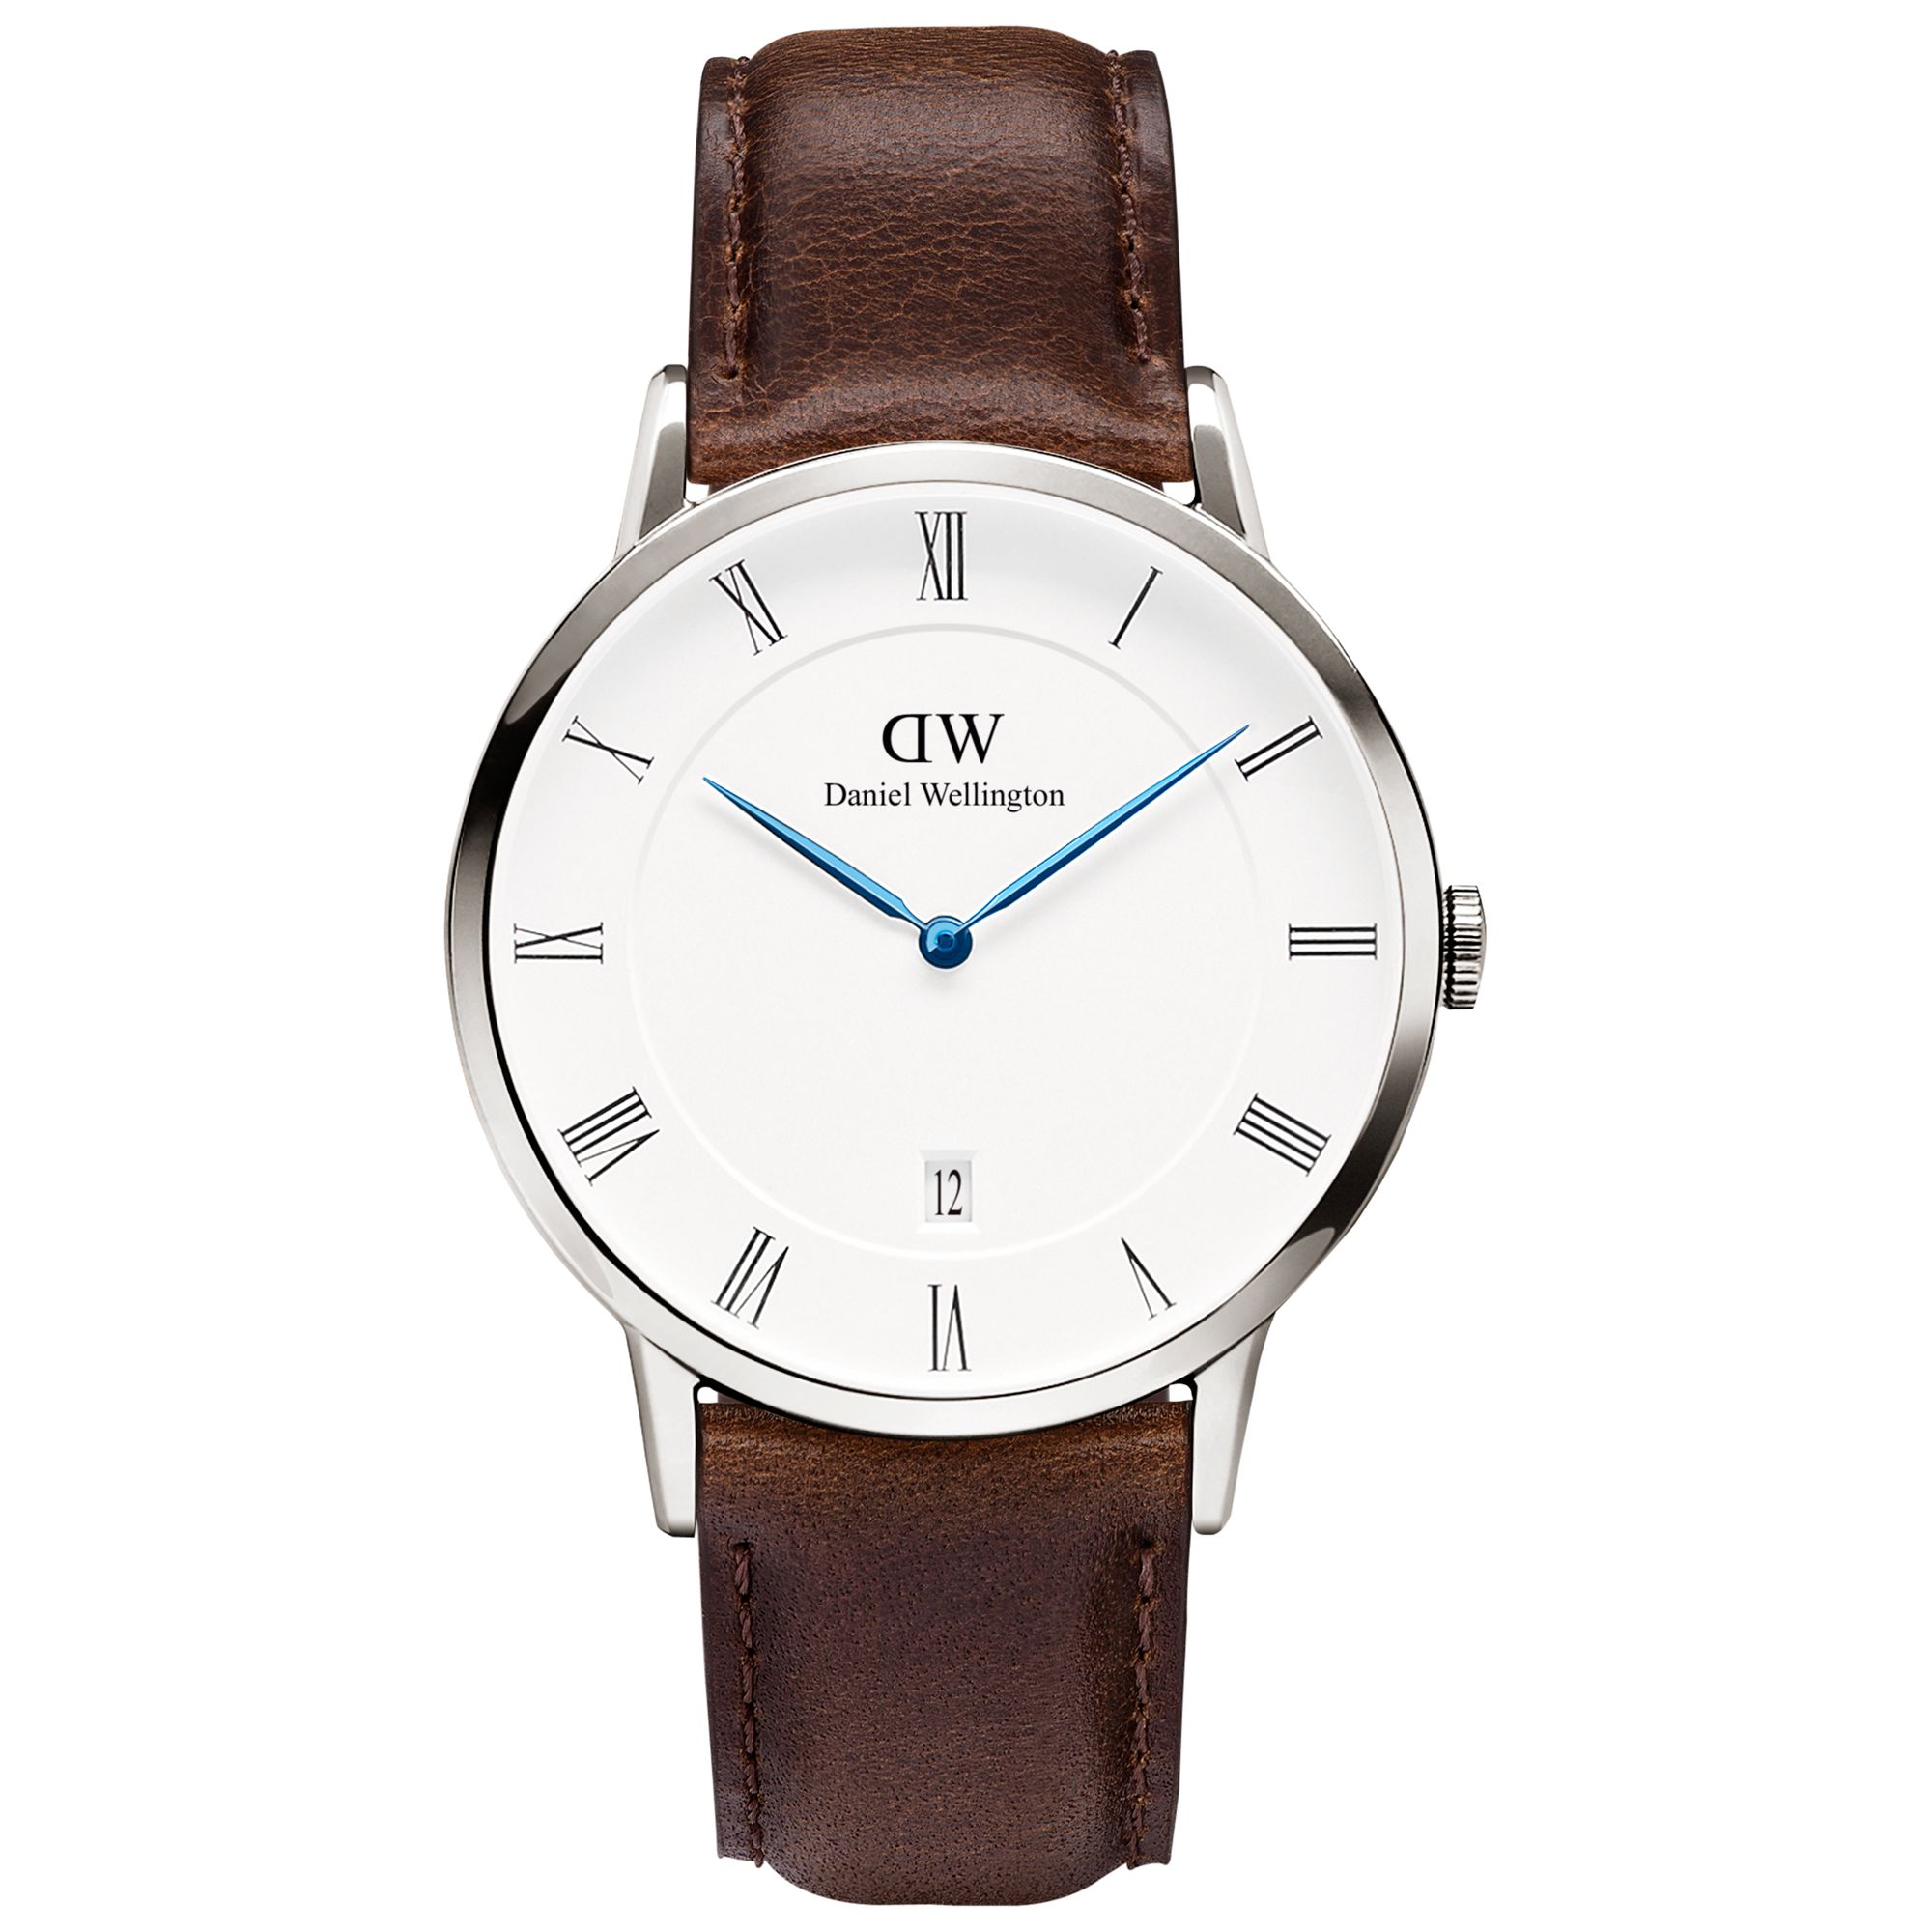 Daniel Wellington Daniel Wellington 1123DW Unisex Dapper Leather Strap Watch, Dark Brown/White